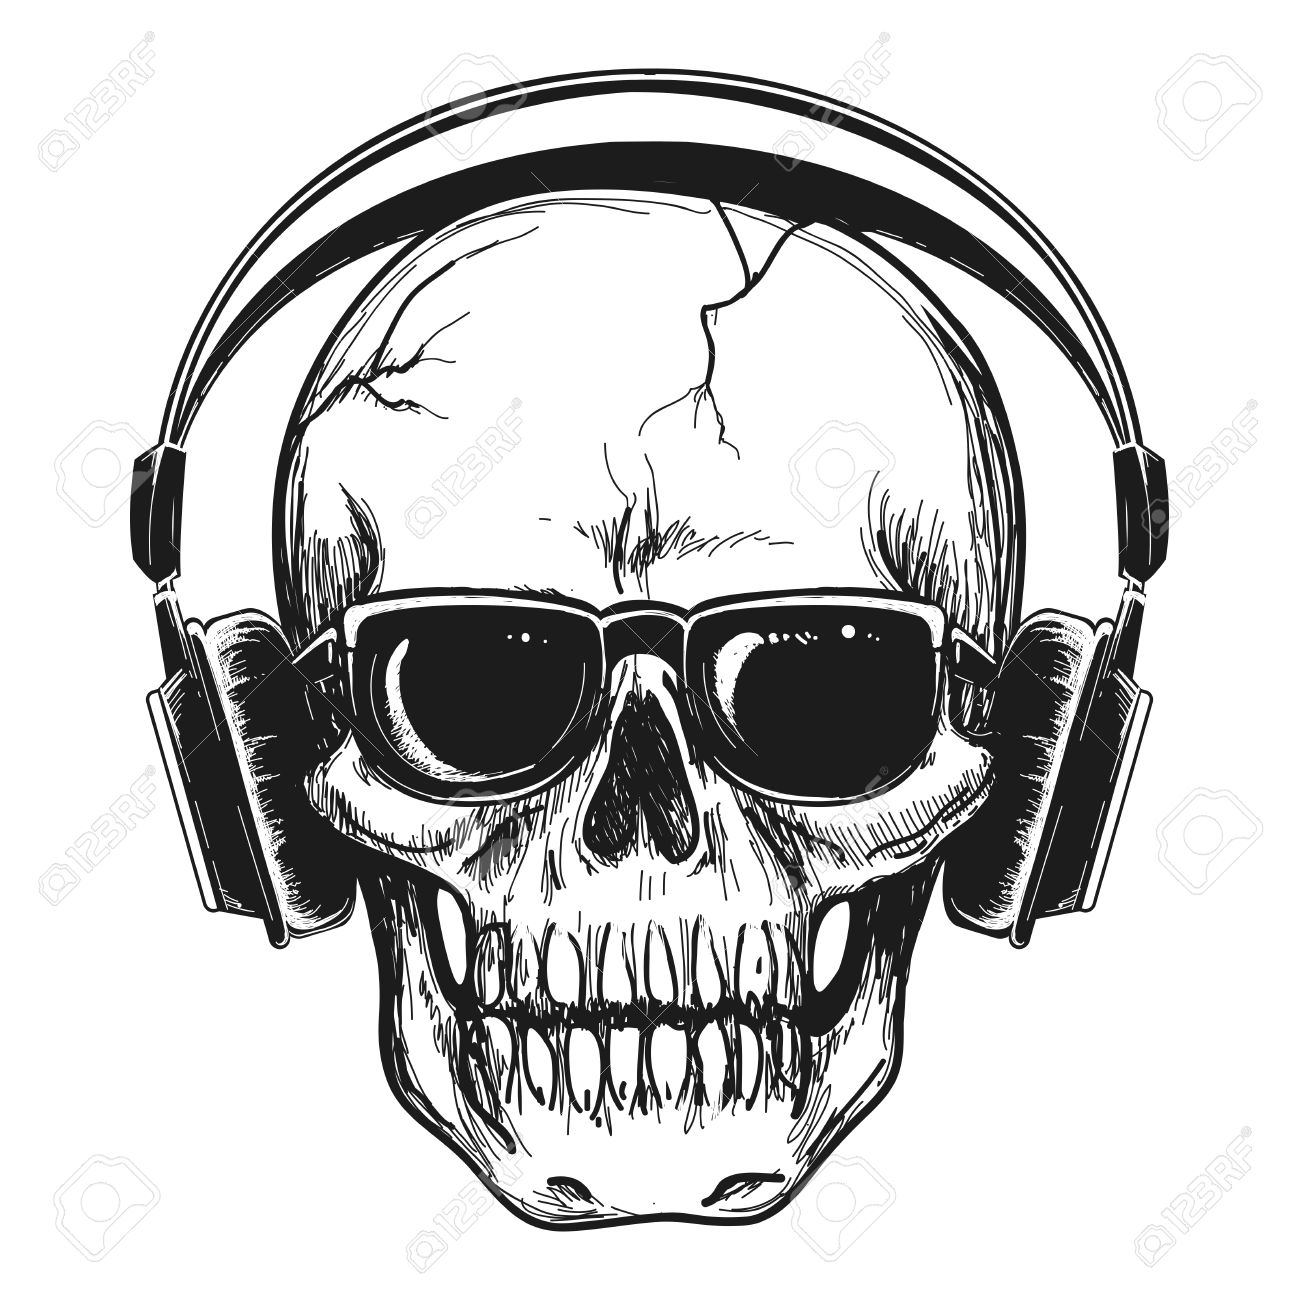 1299x1300 Human Skull With Headphones And Sunglasses Enjoying Music Vector